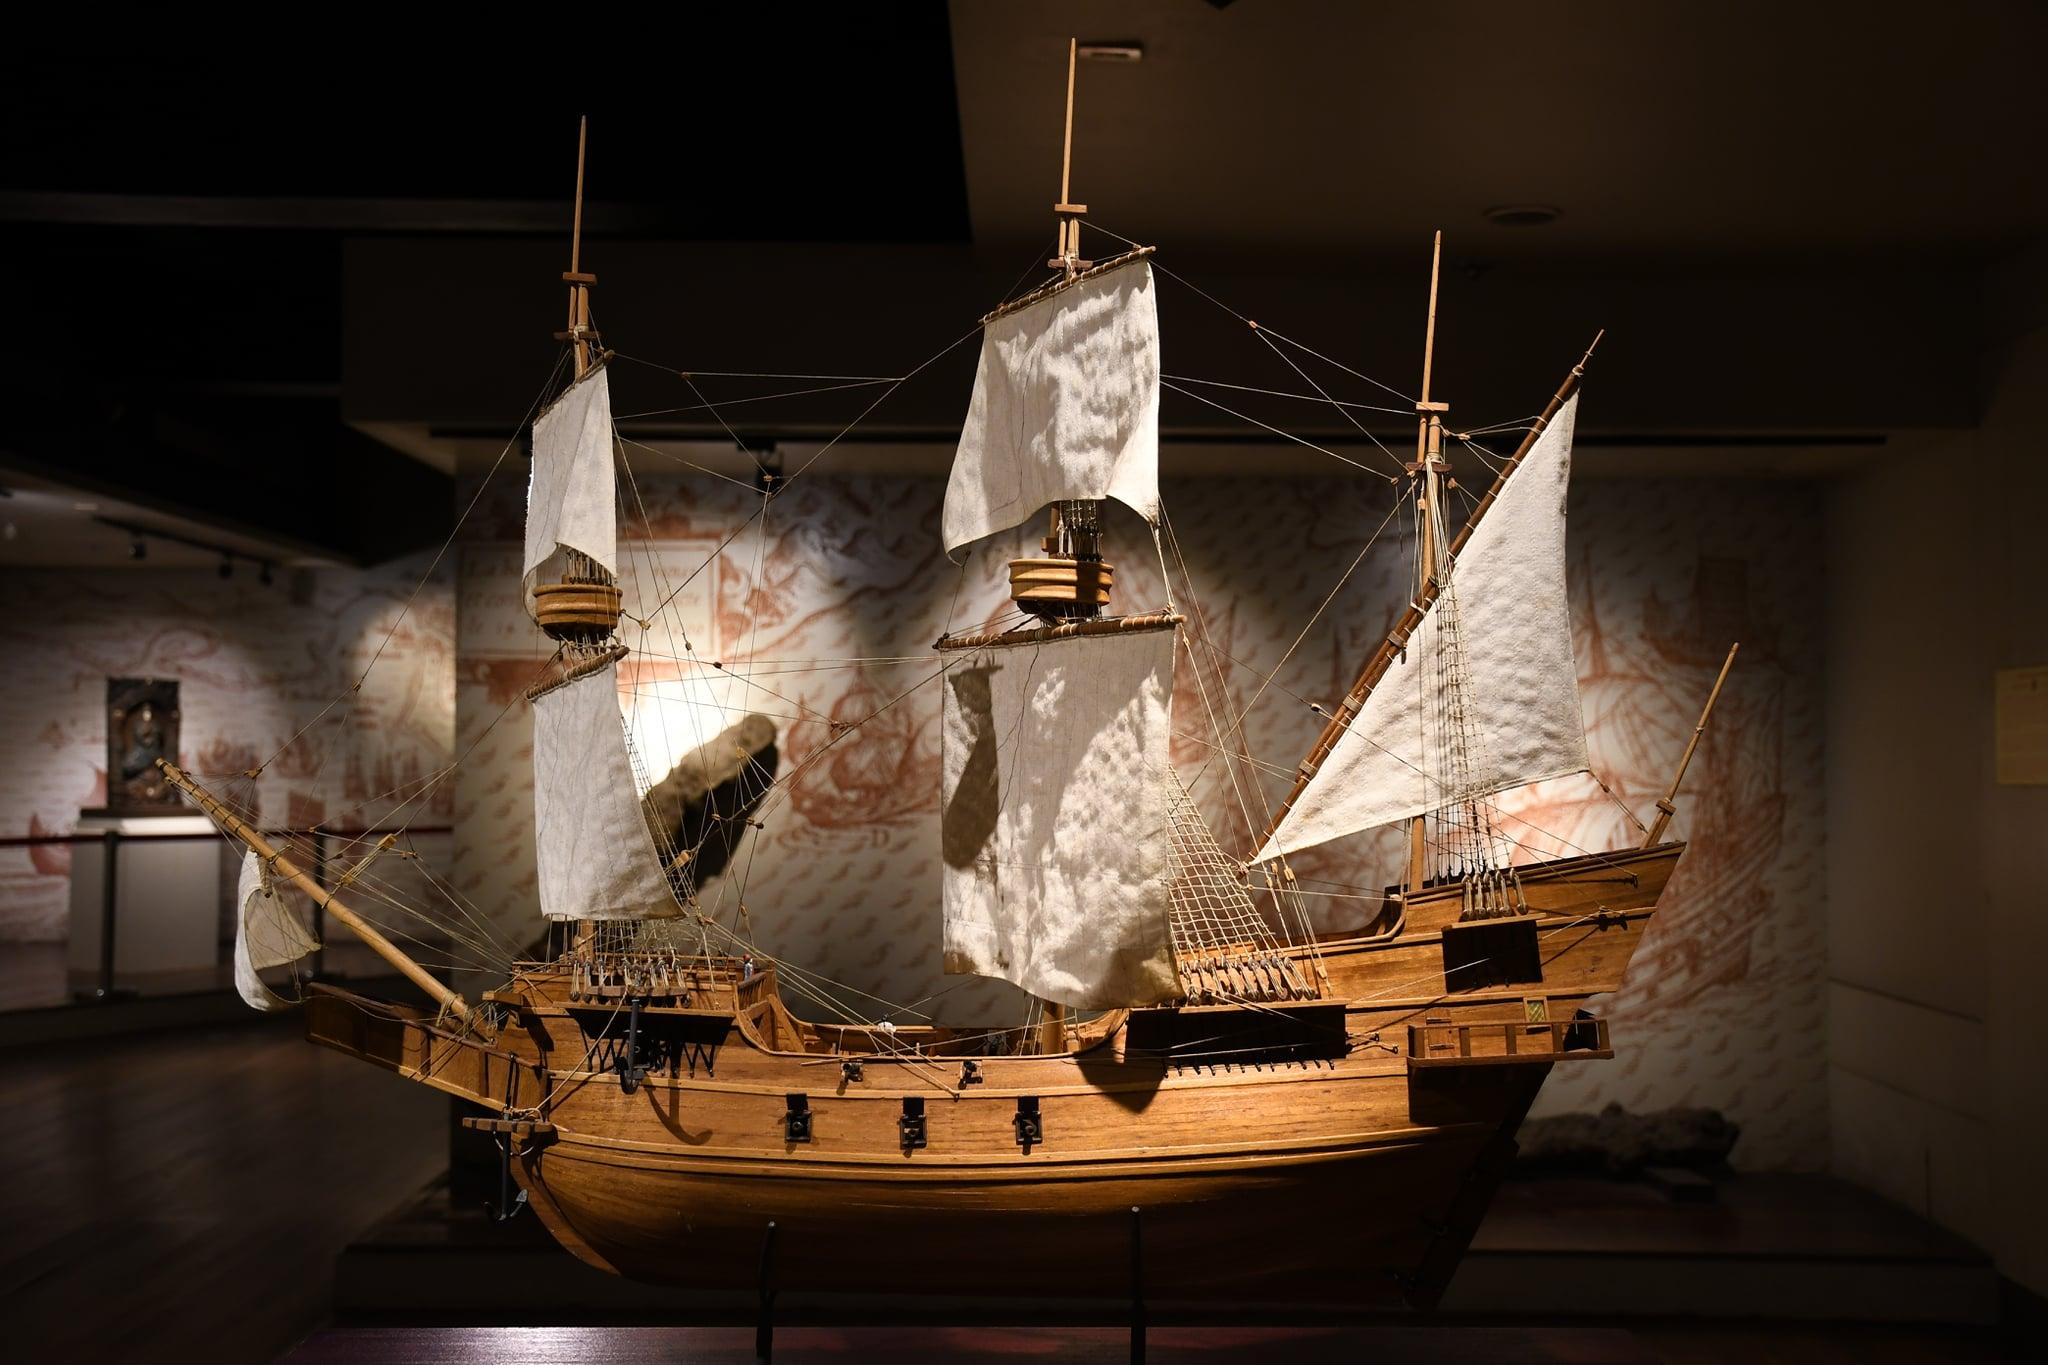 galleon ship with sails replica